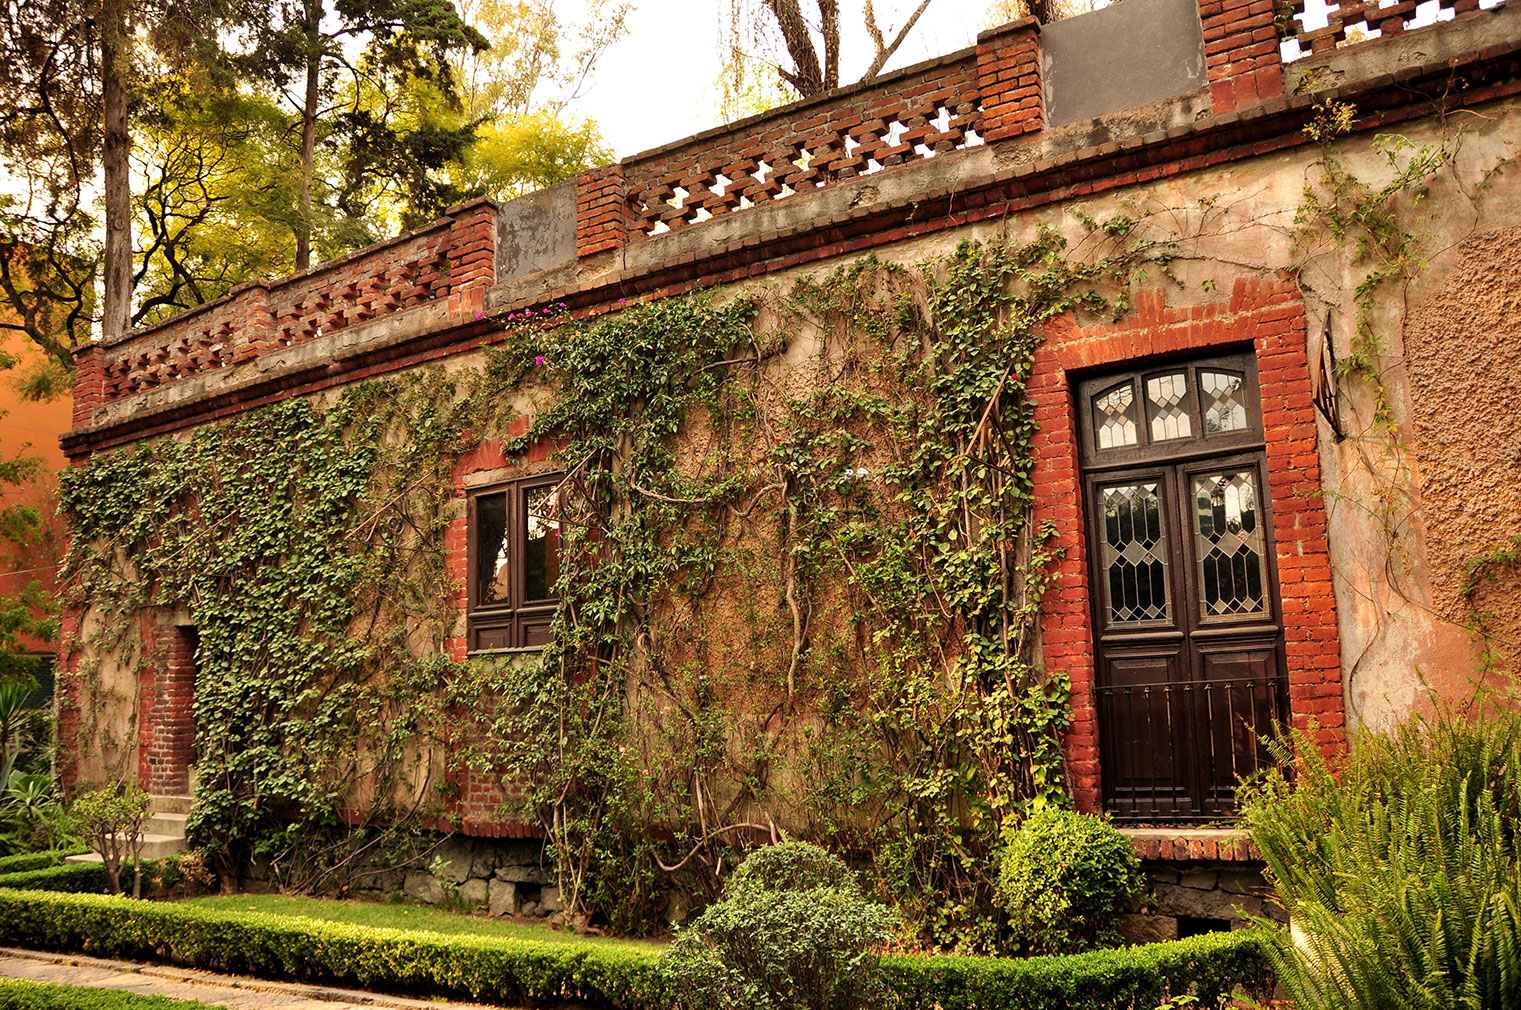 Museo Casa de Leon Trotsky